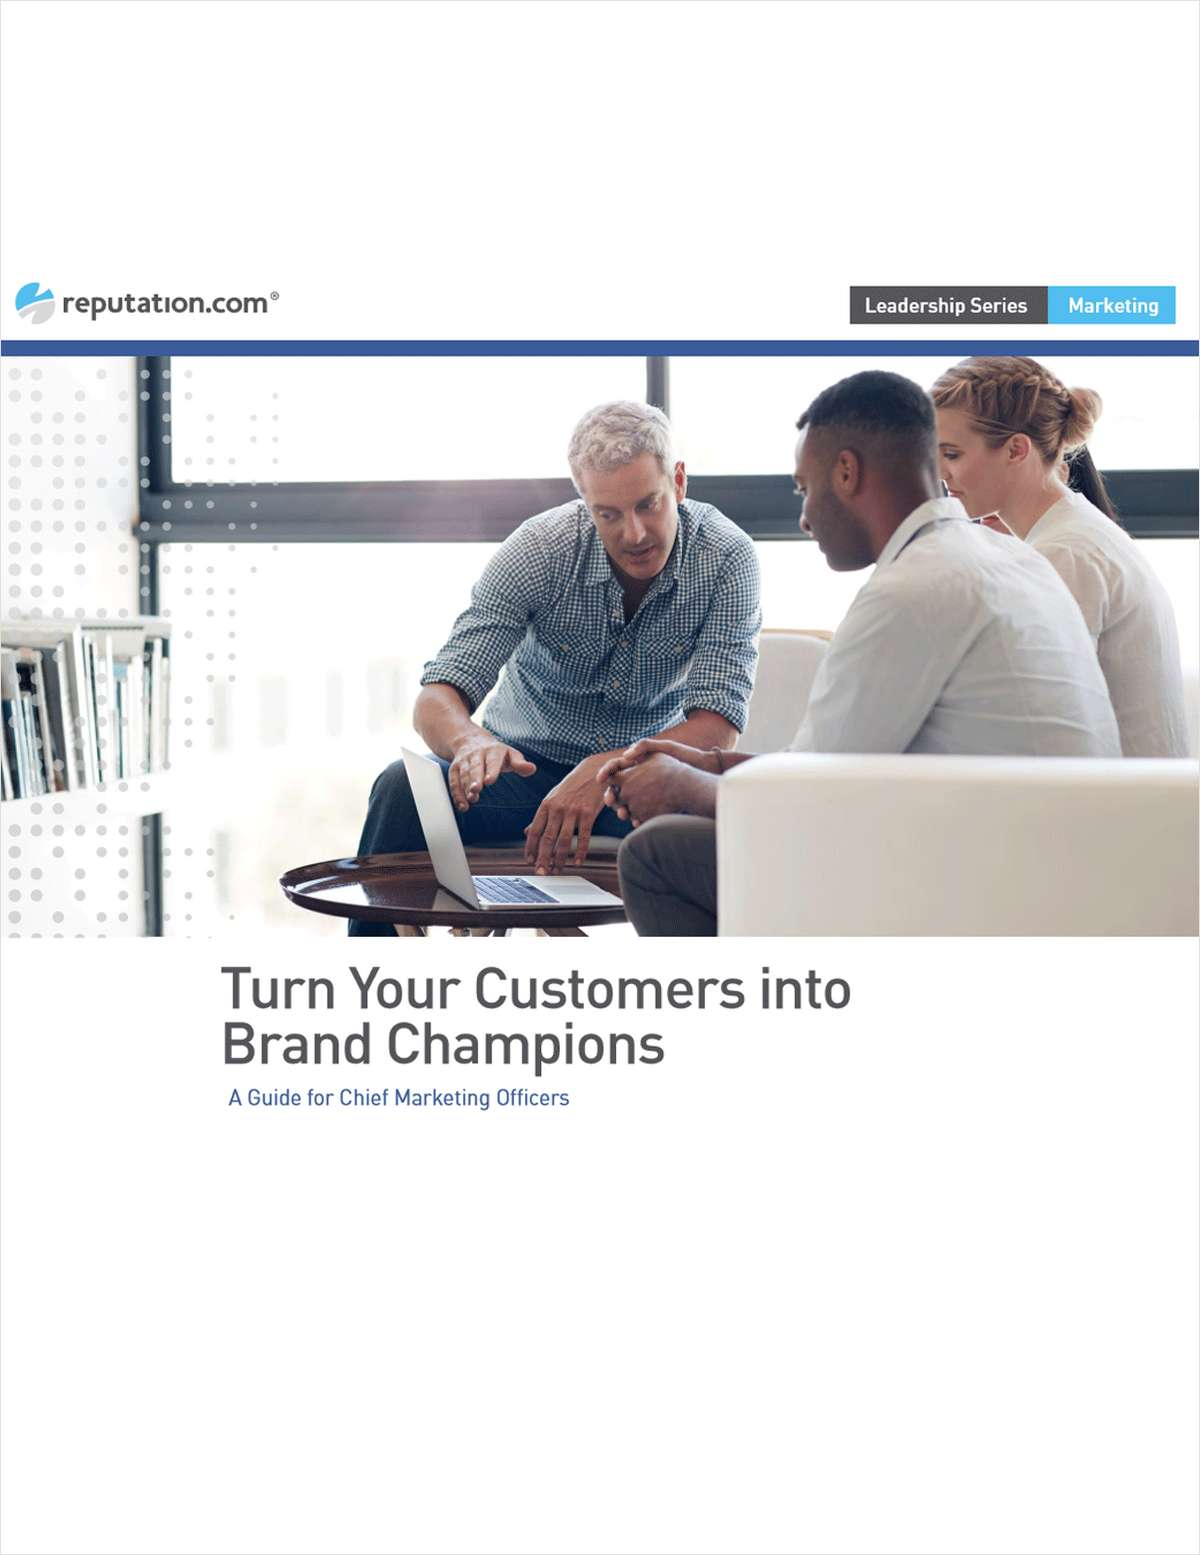 Turn Customers into Brand Champions